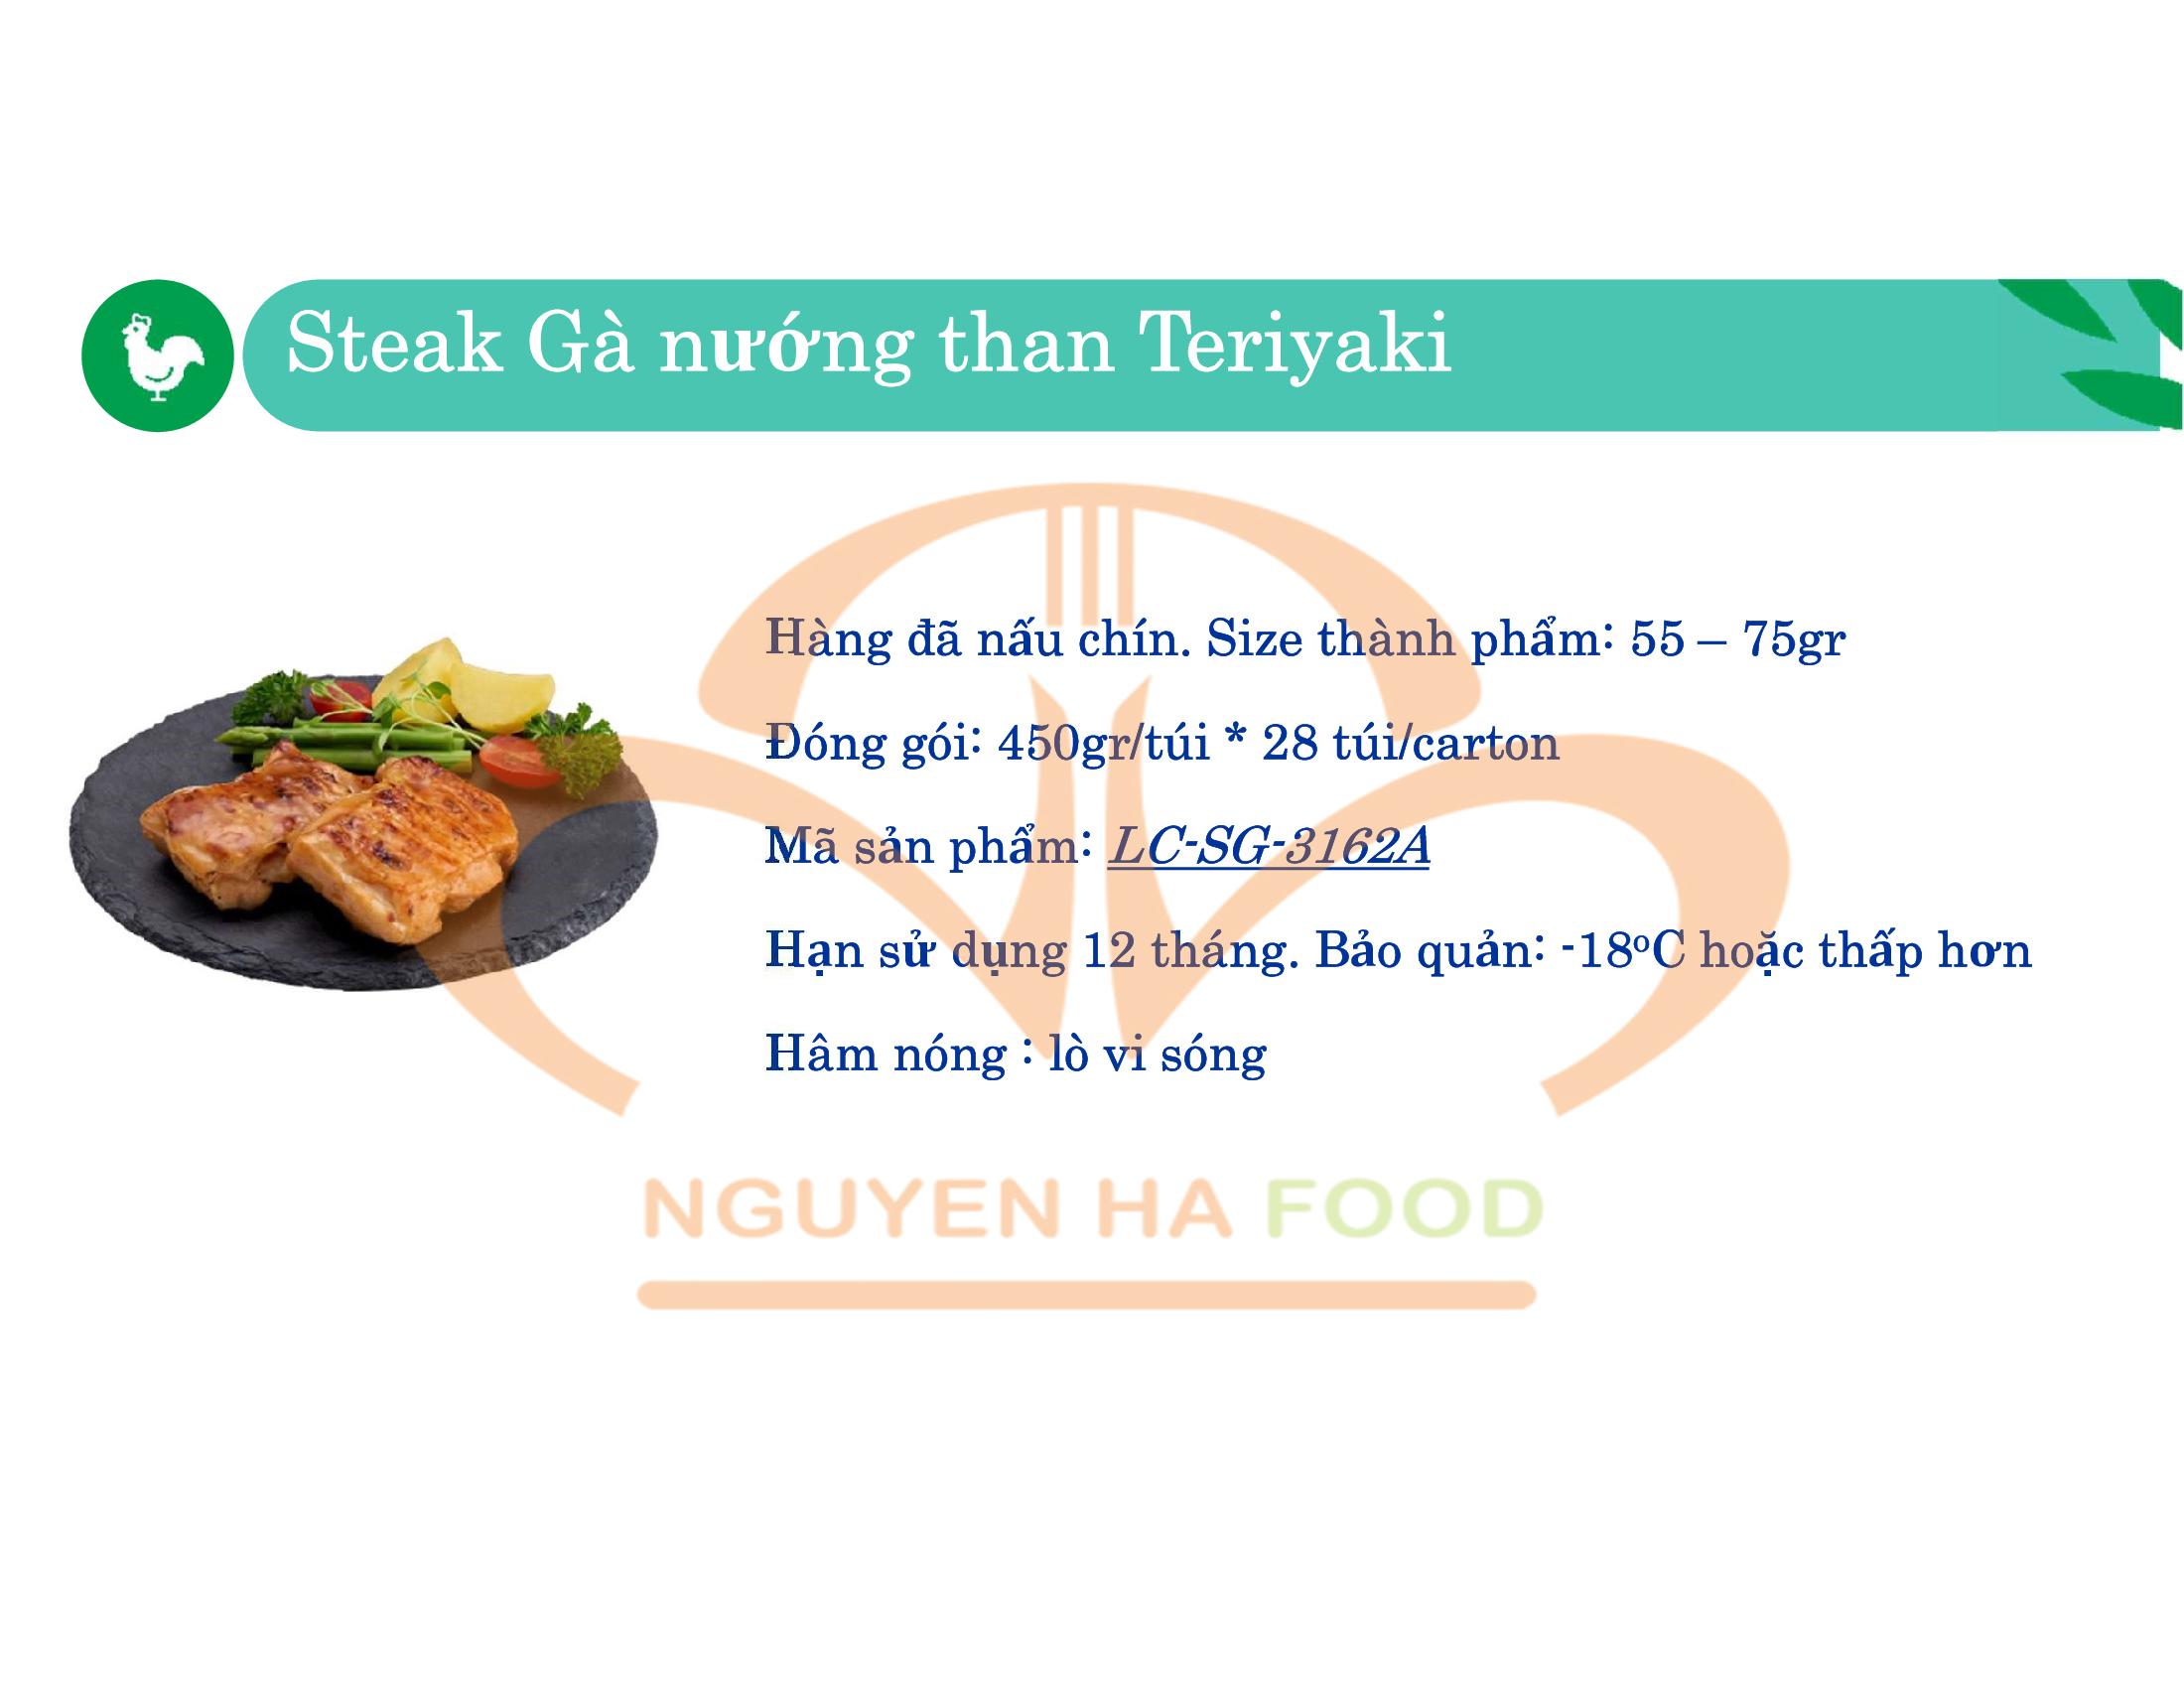 02 STEAK GA NUONG THAN TERIYAKI CP NGUYEN HA FOOD